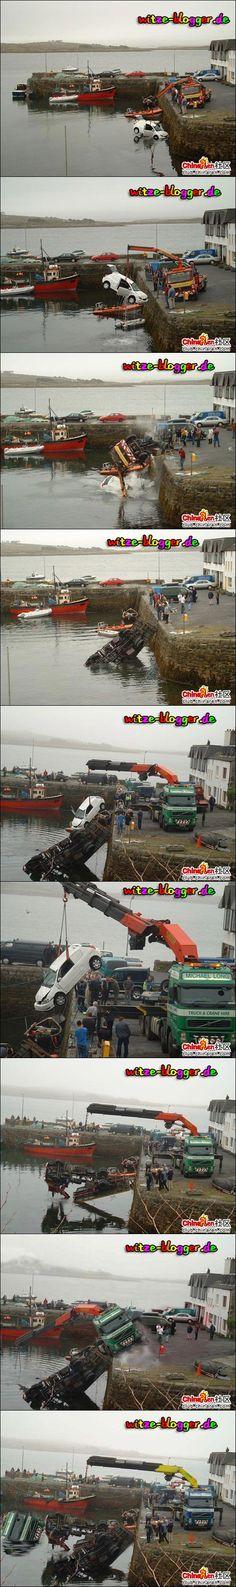 crazy crane accidents... .@Jorge Cavalcante (JORGENCA)